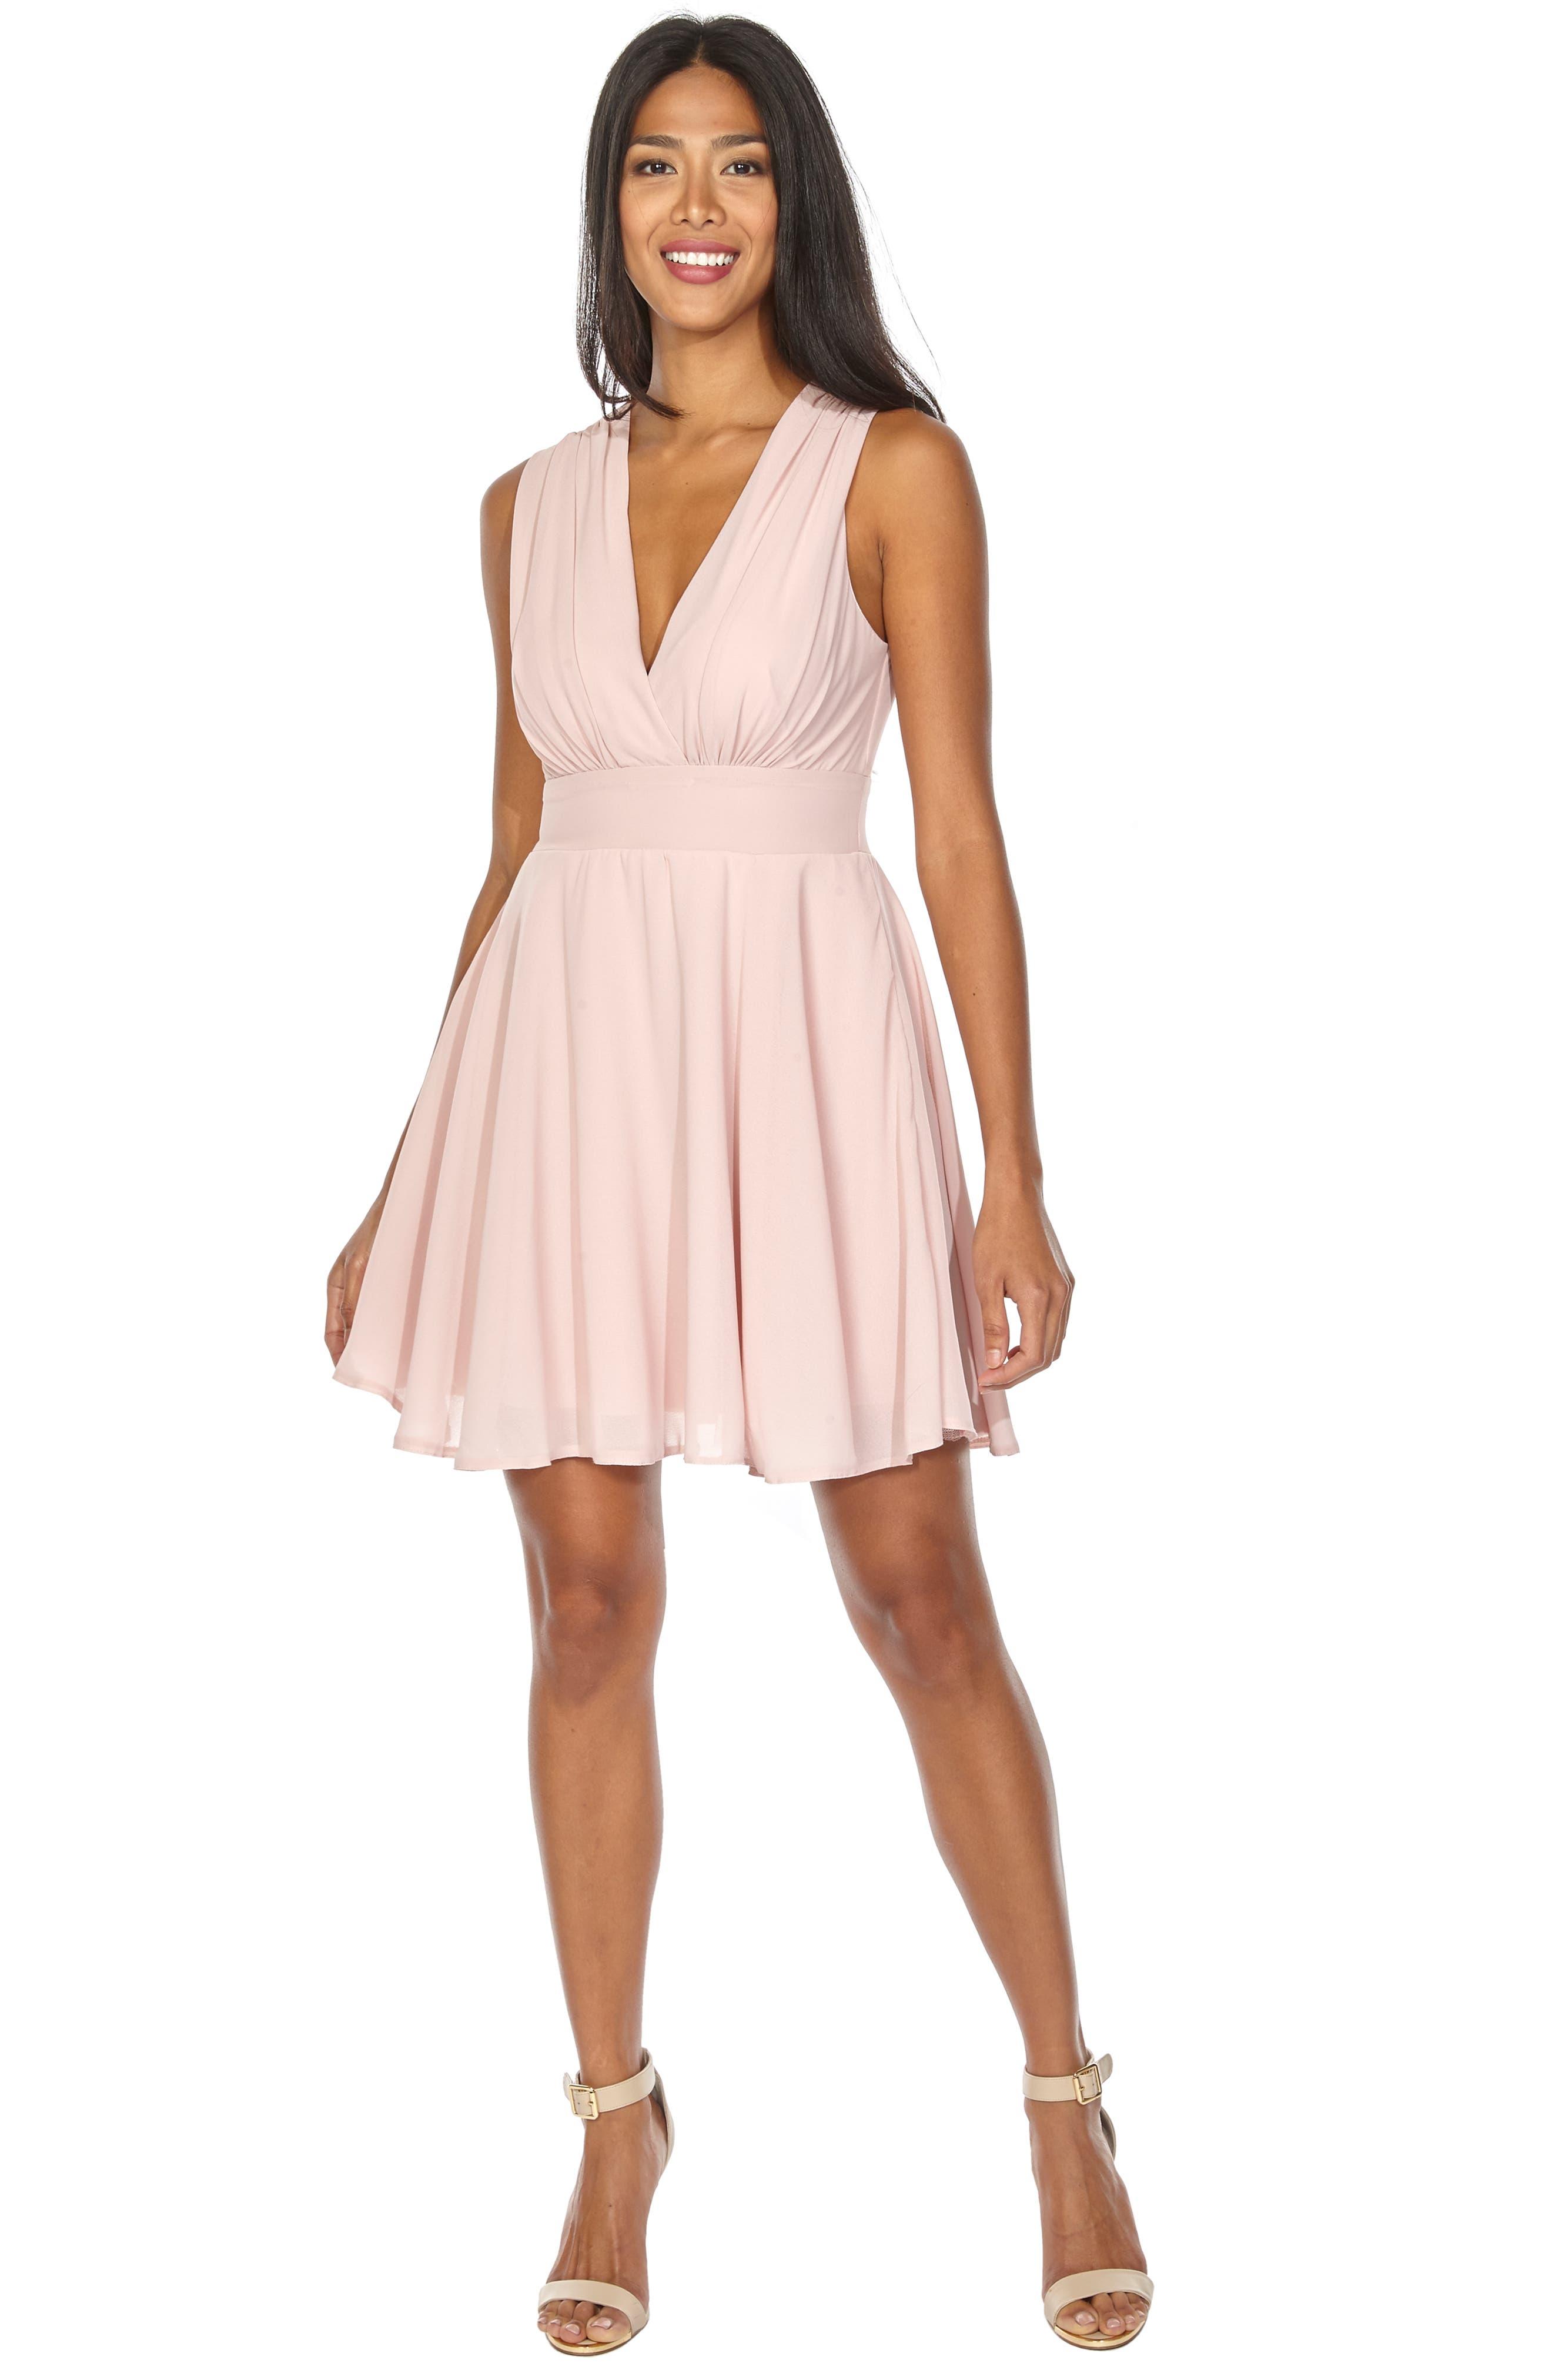 915f29ccc51 Short Prom Dresses 2019